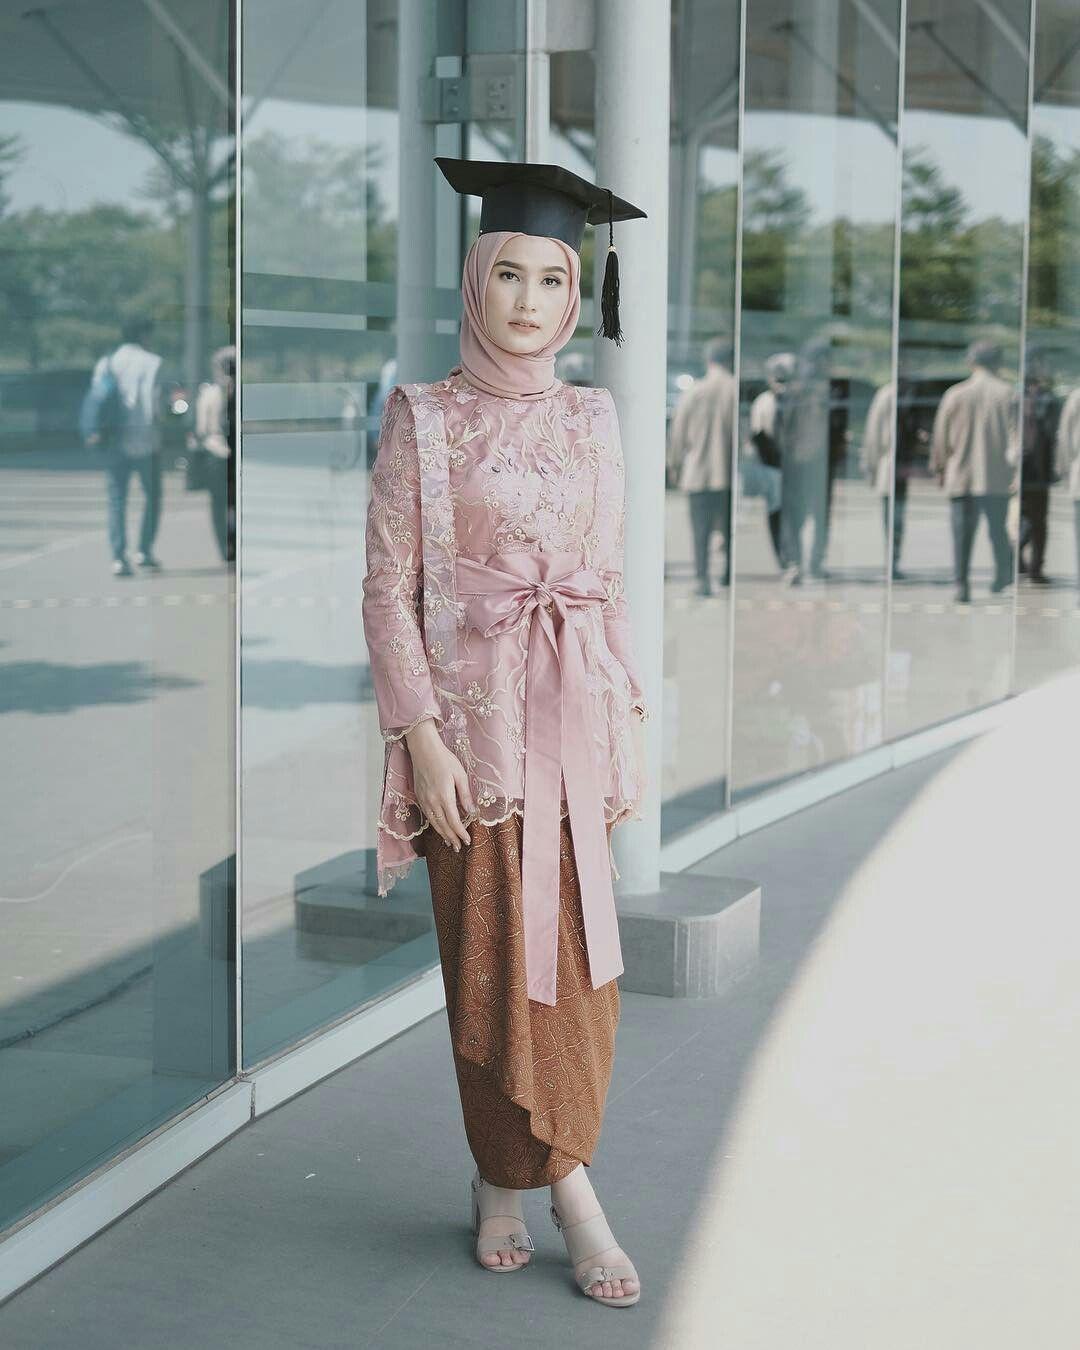 Pin oleh Lulu Auliya di kondangan  Pakaian pesta, Pakaian wanita